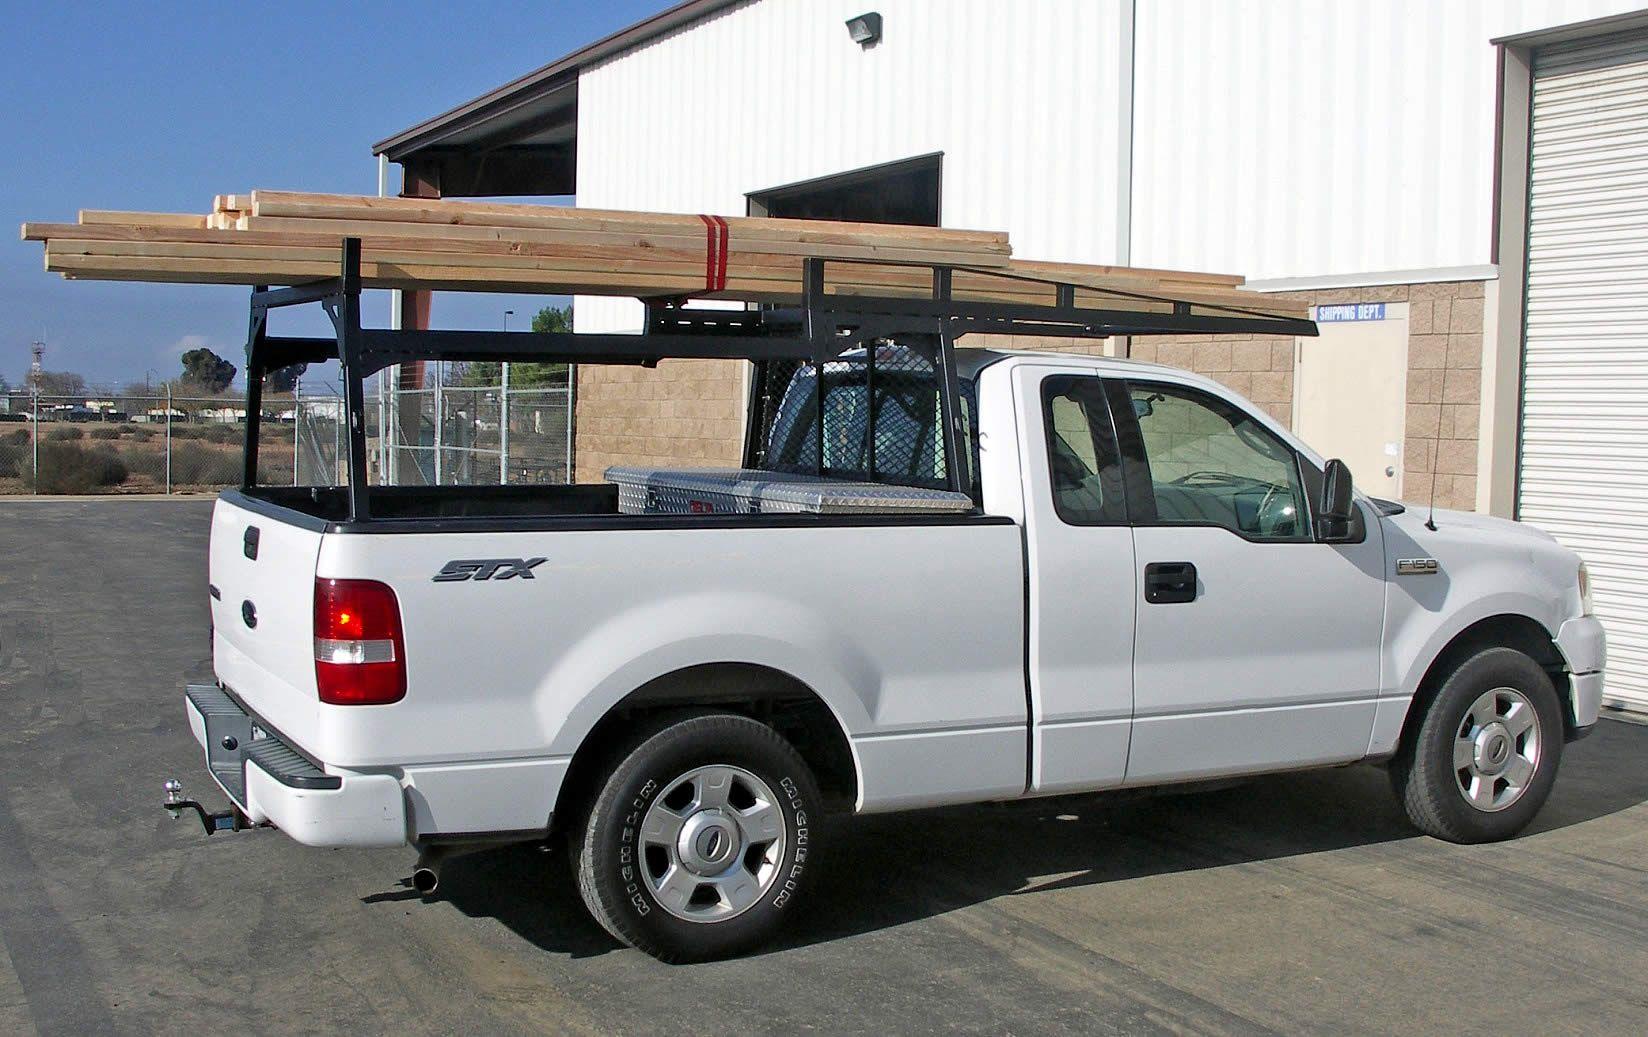 heavy duty truck racks (www.heavydutytruckracks) image of job